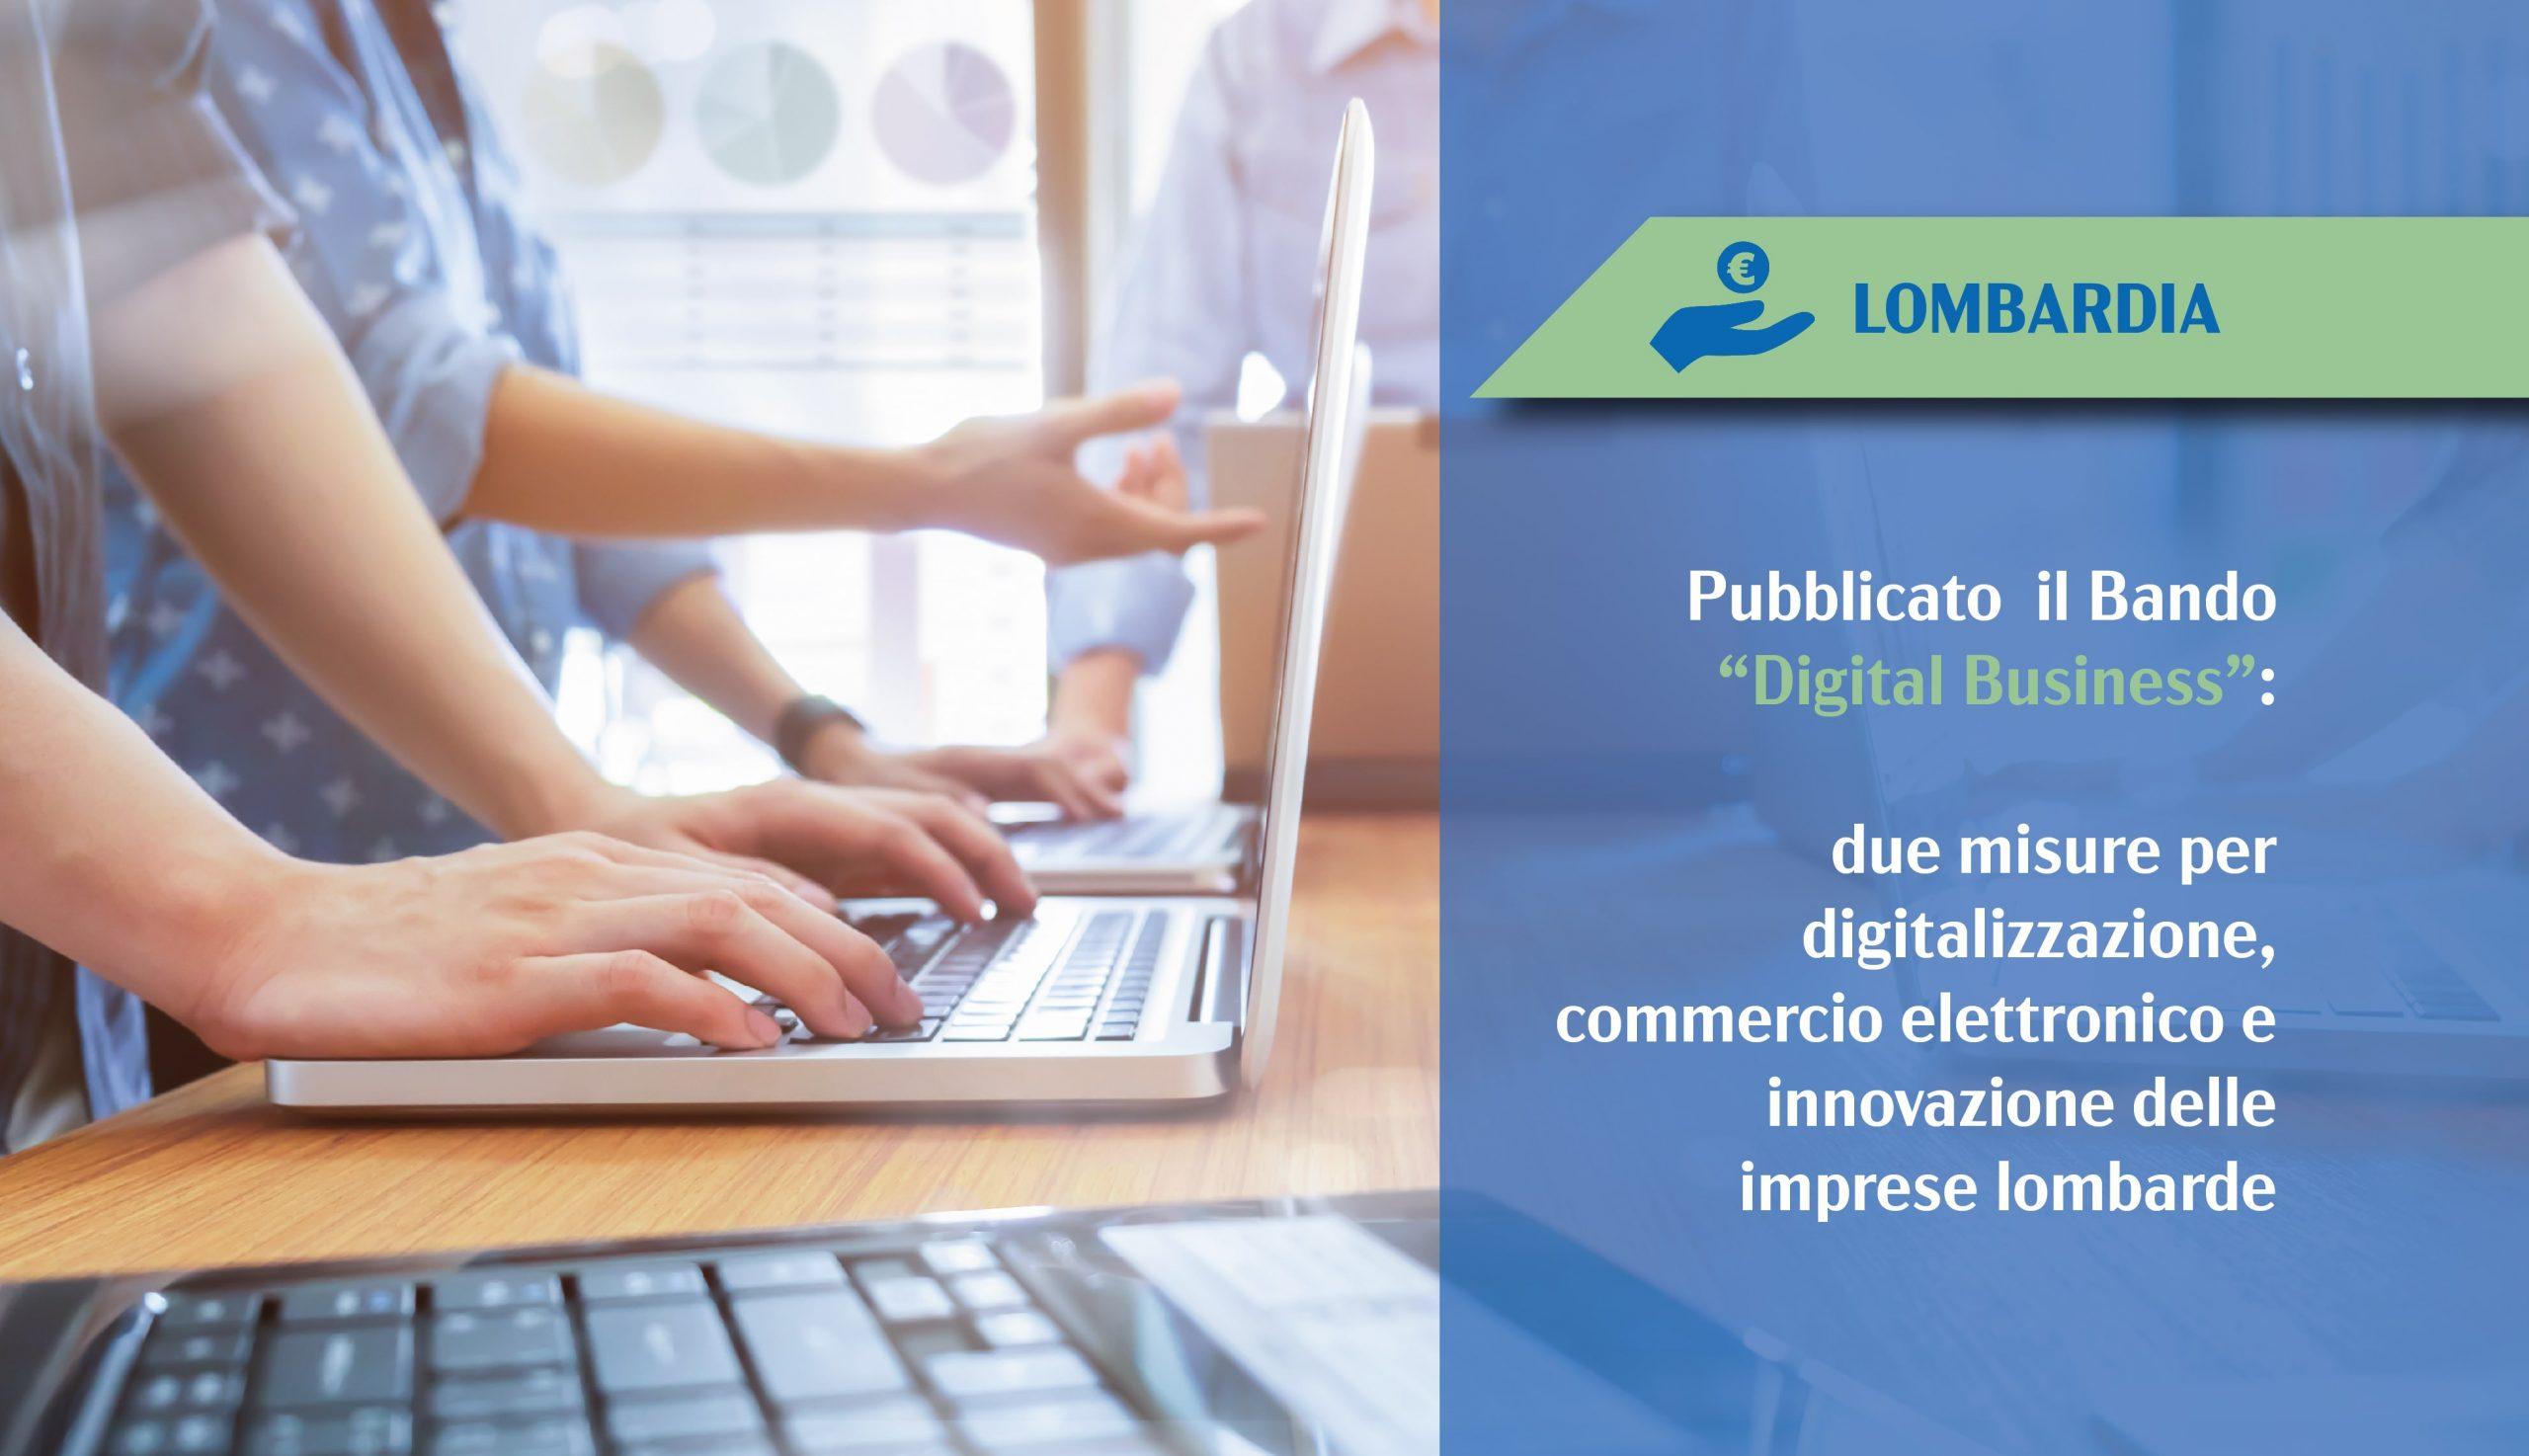 Lombardia Digital Business